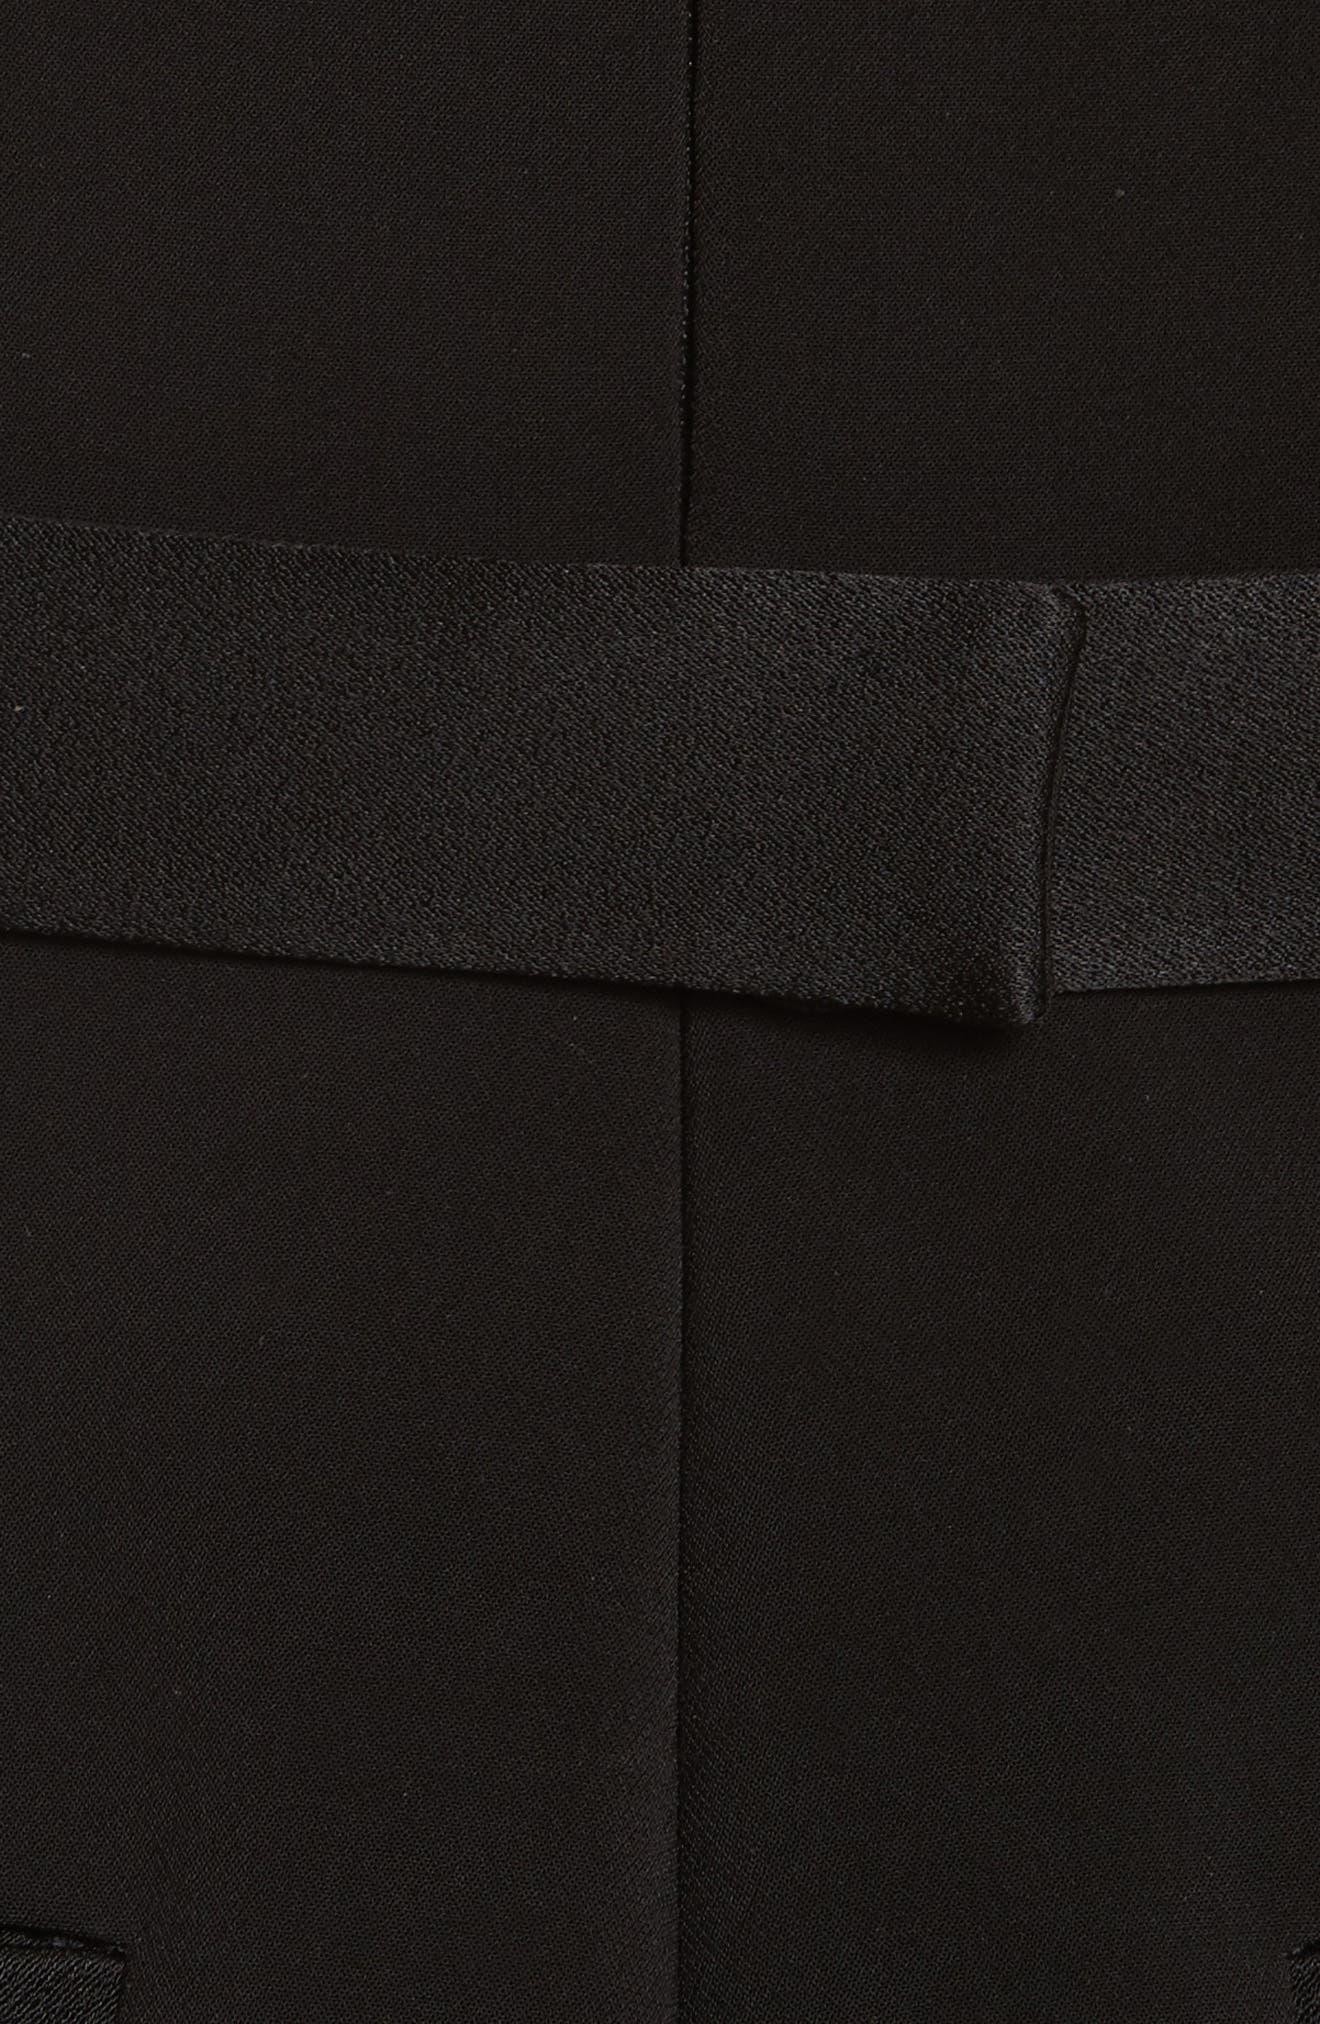 Diane Kruger x GREY Jason Wu Crepe Straight Leg Jumpsuit,                             Alternate thumbnail 5, color,